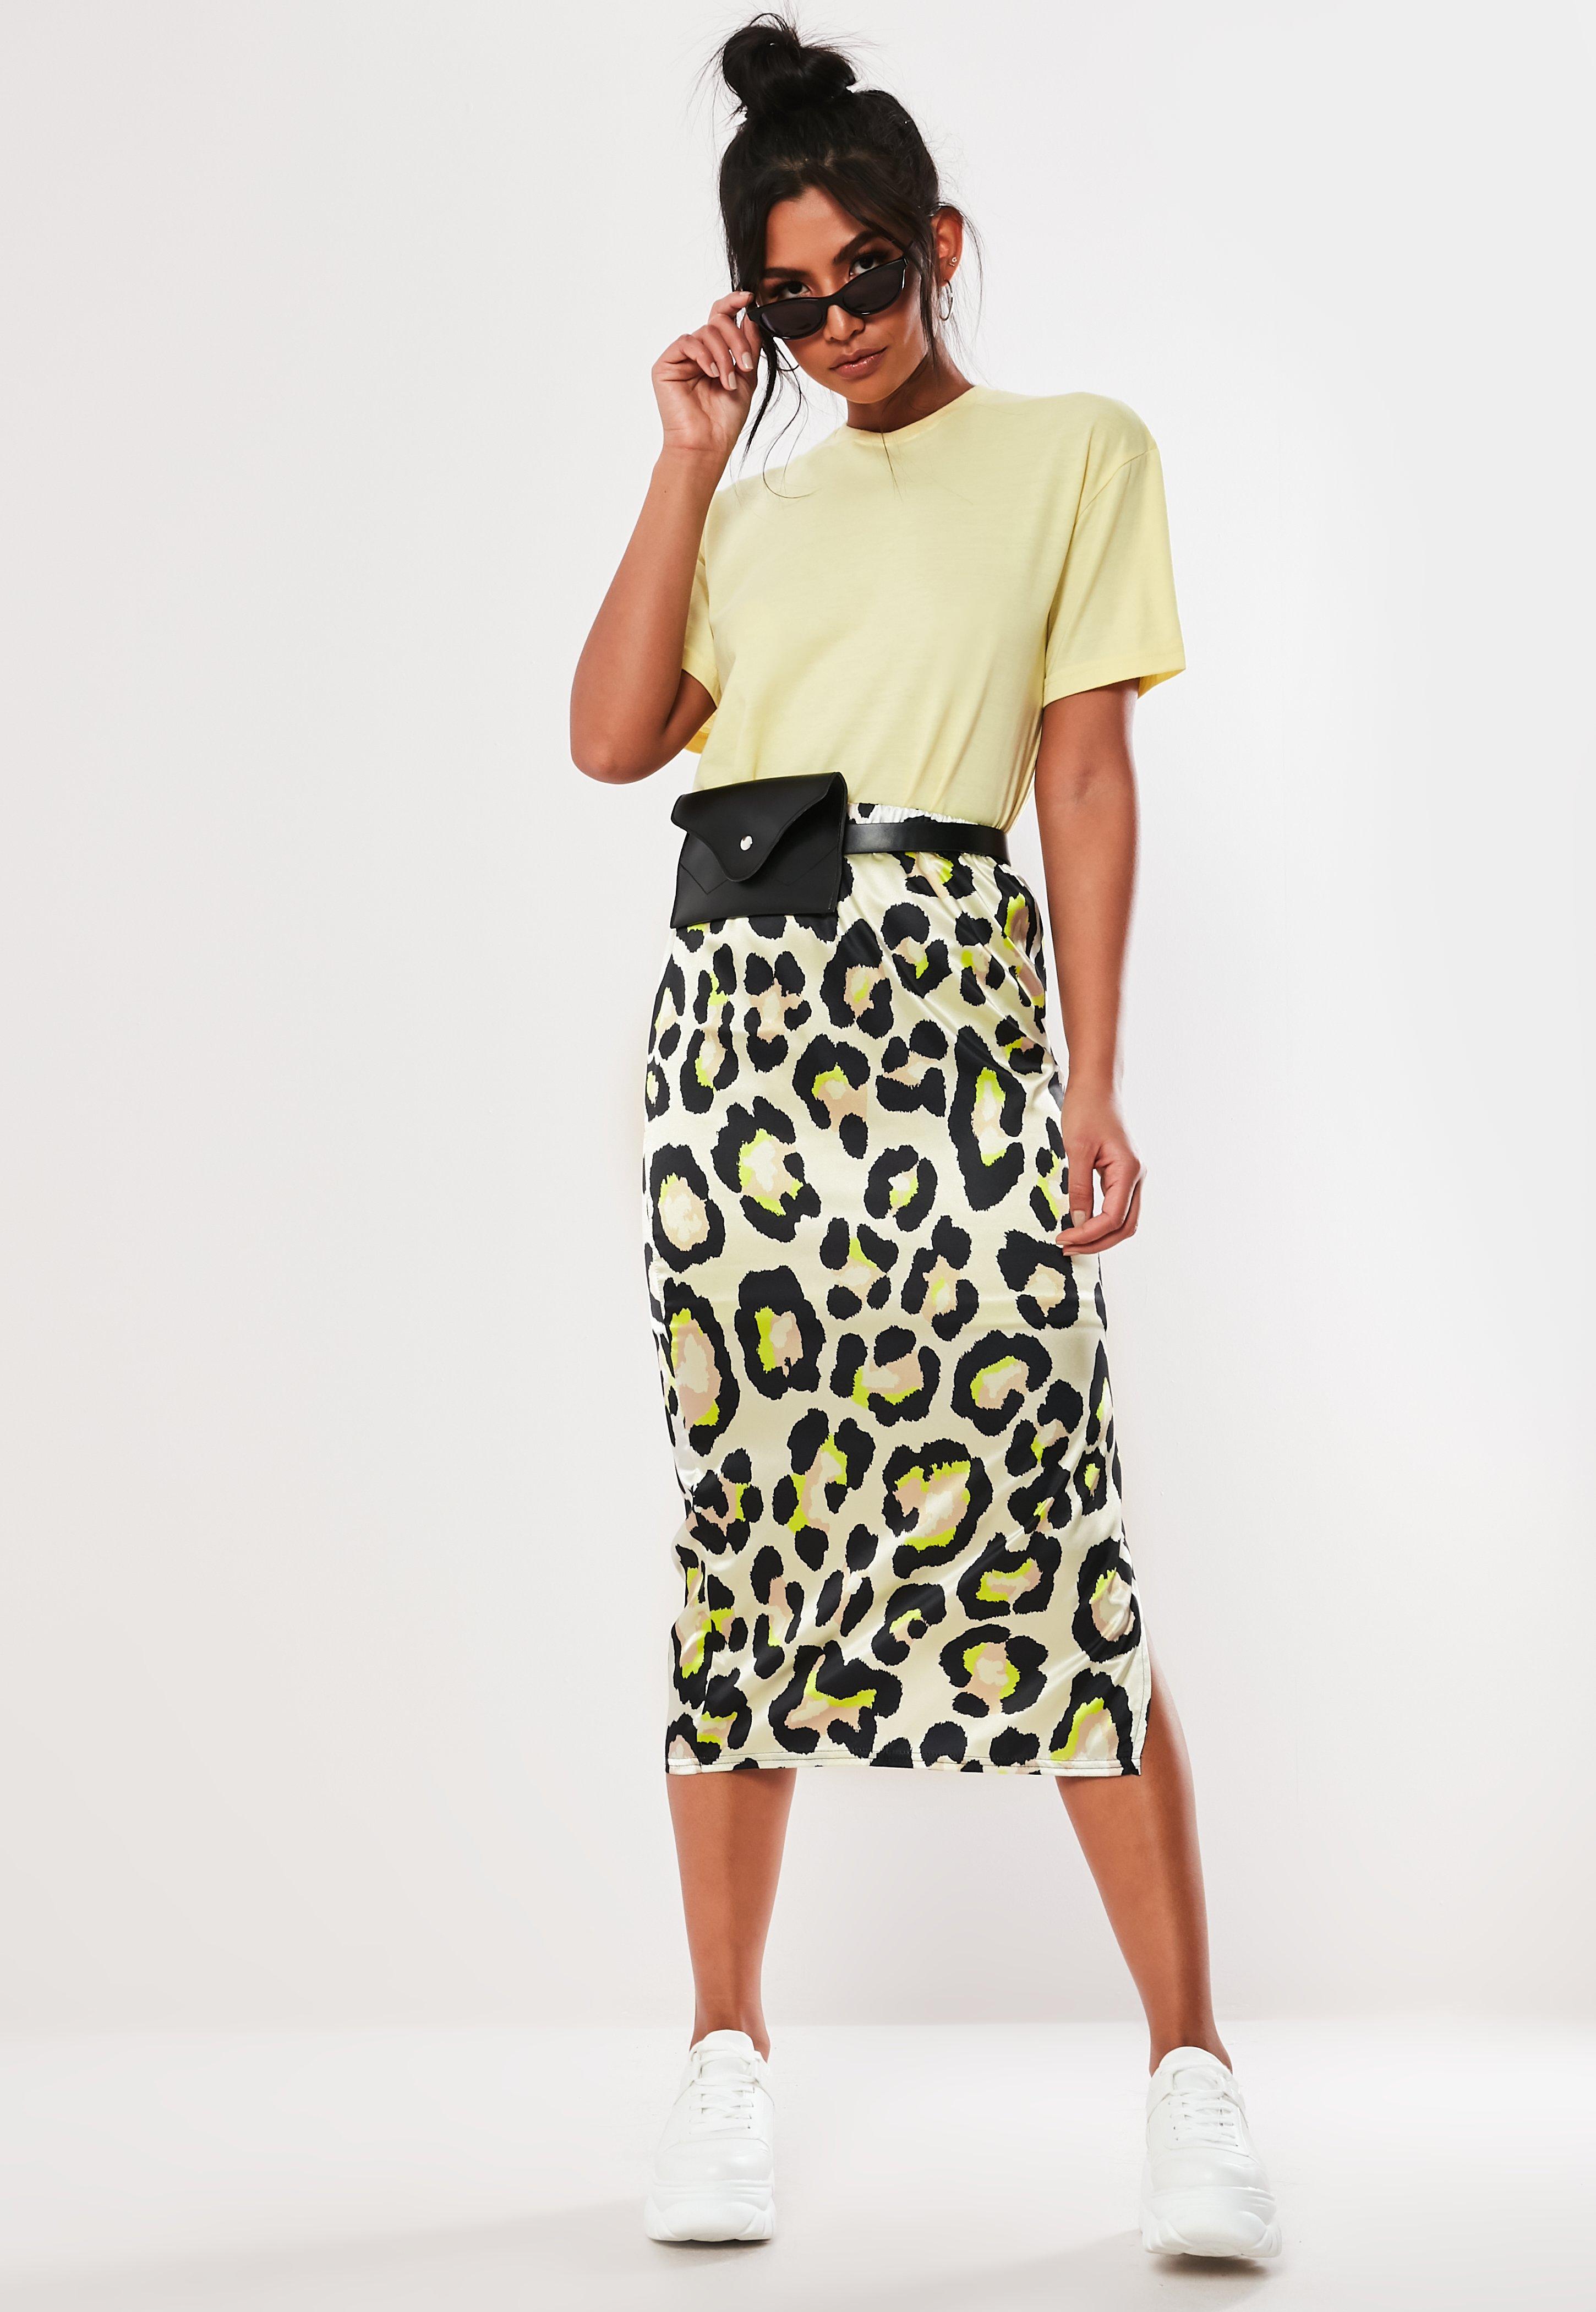 67b286d26b22b Long Slips For Maxi Skirts | Saddha